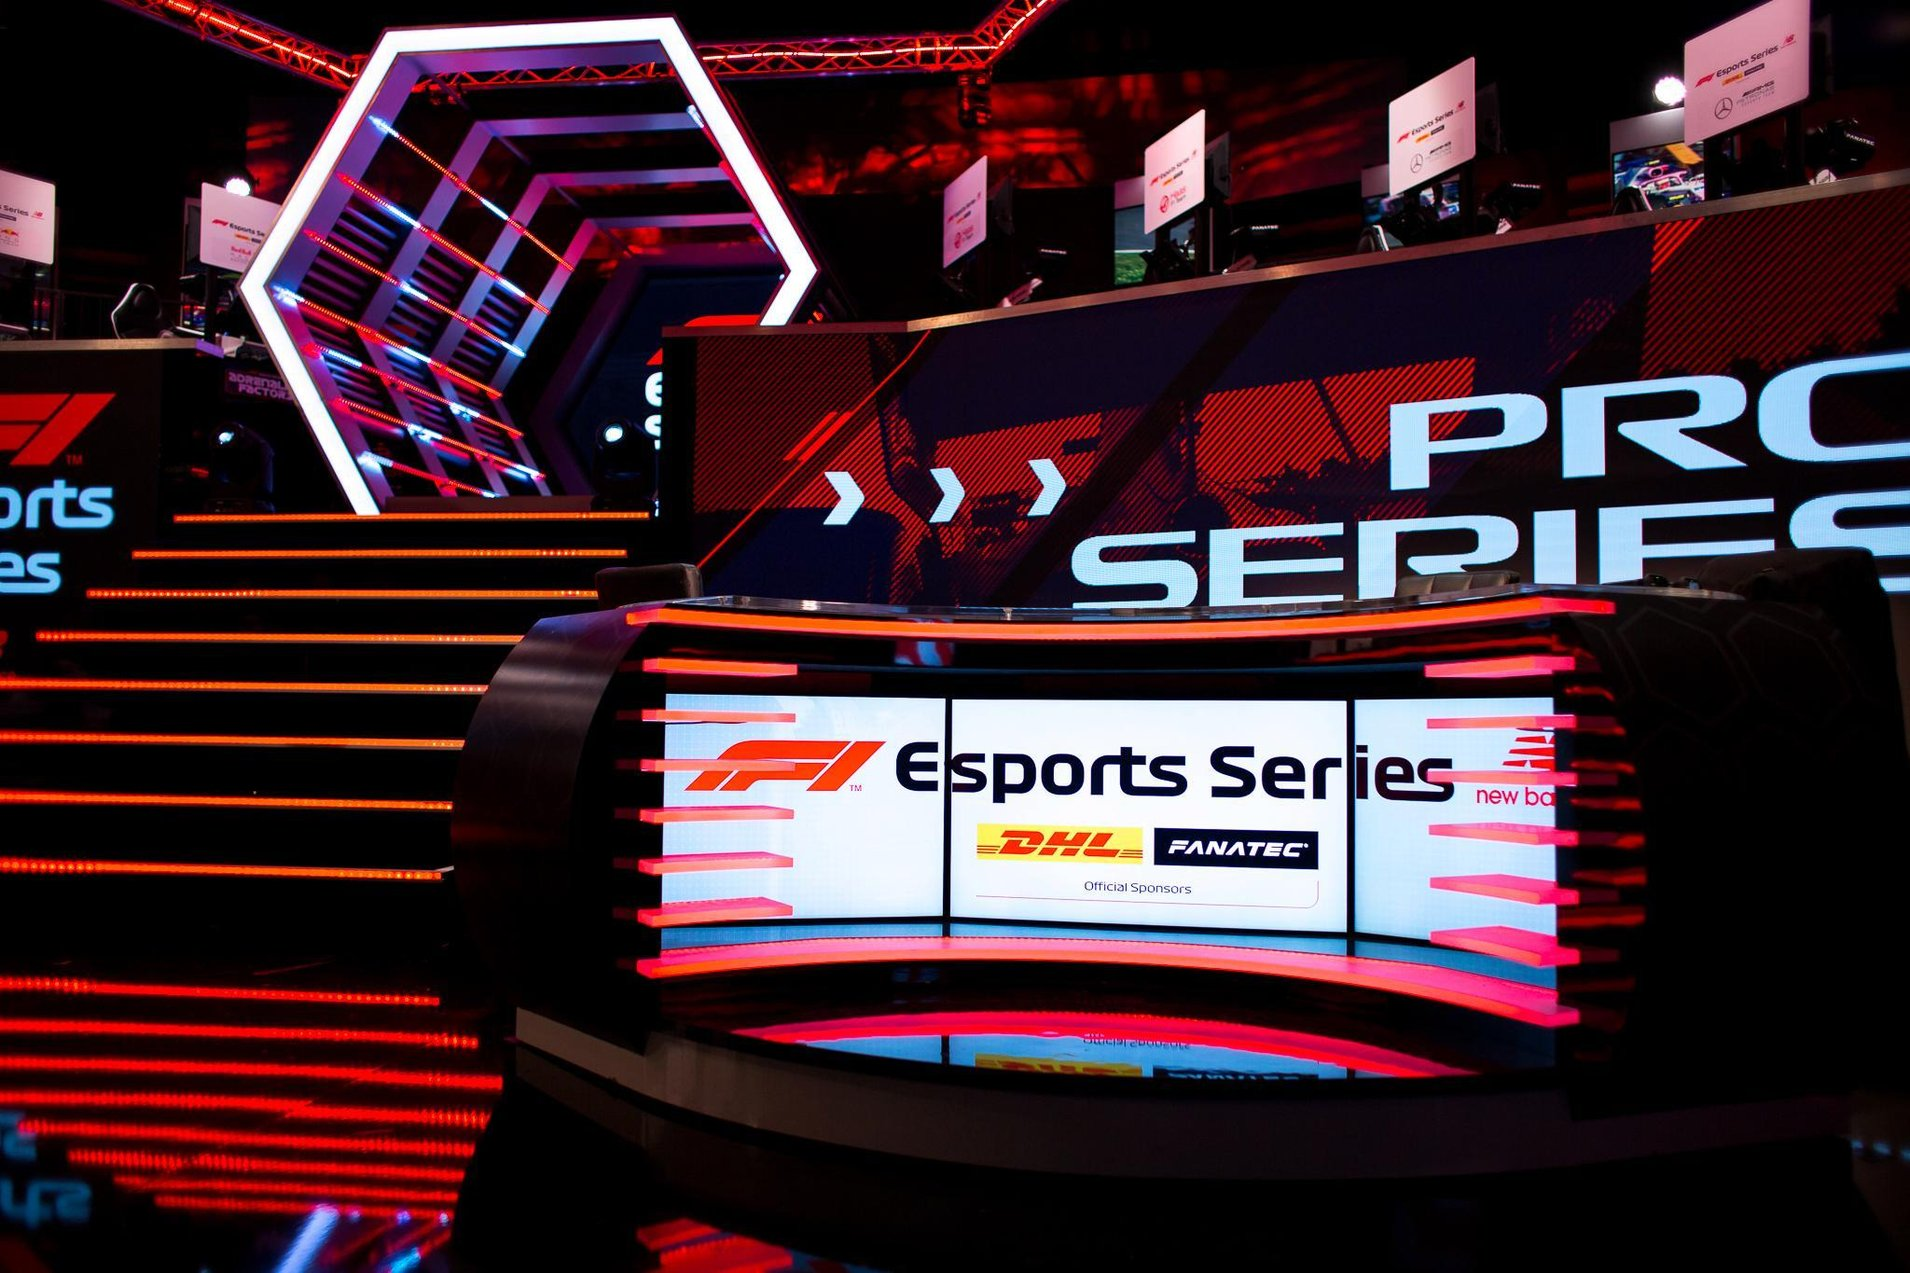 F1 Esport Series Grand Final – Gallery 16